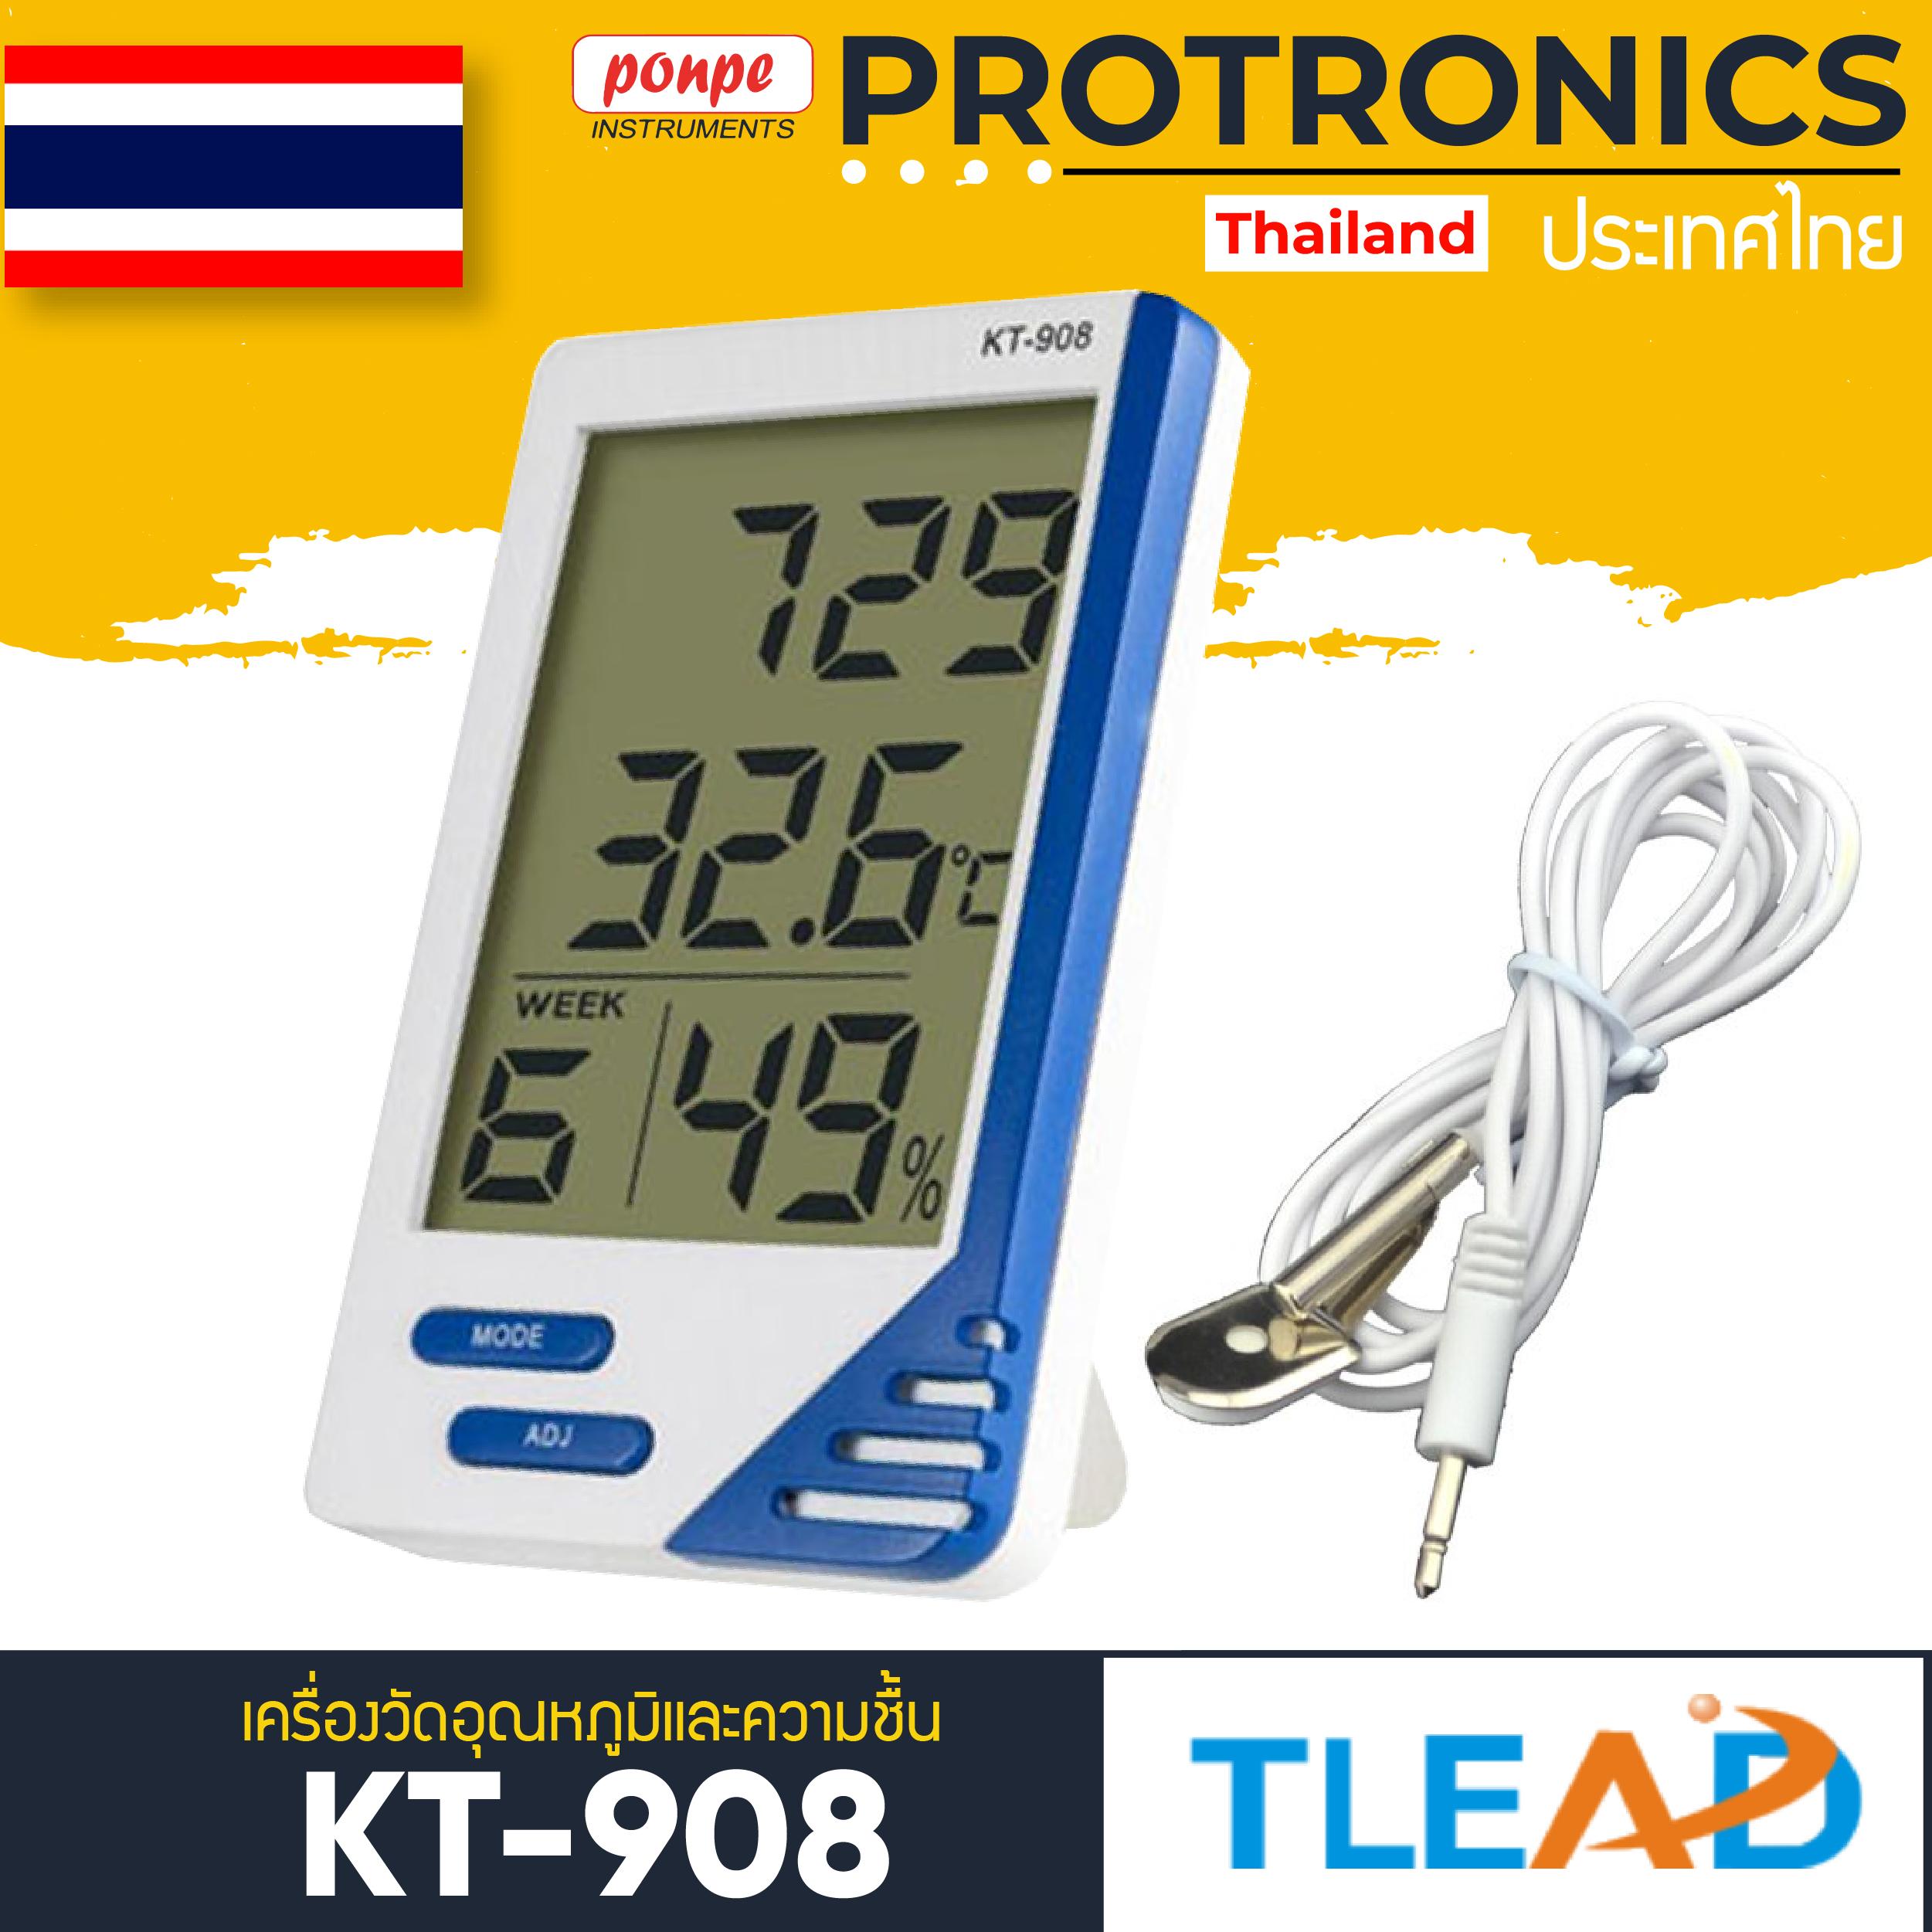 KT-908 JEDTO เครื่องวัดอุณหภูมิ ความชื้น Thermo-Hygrometer